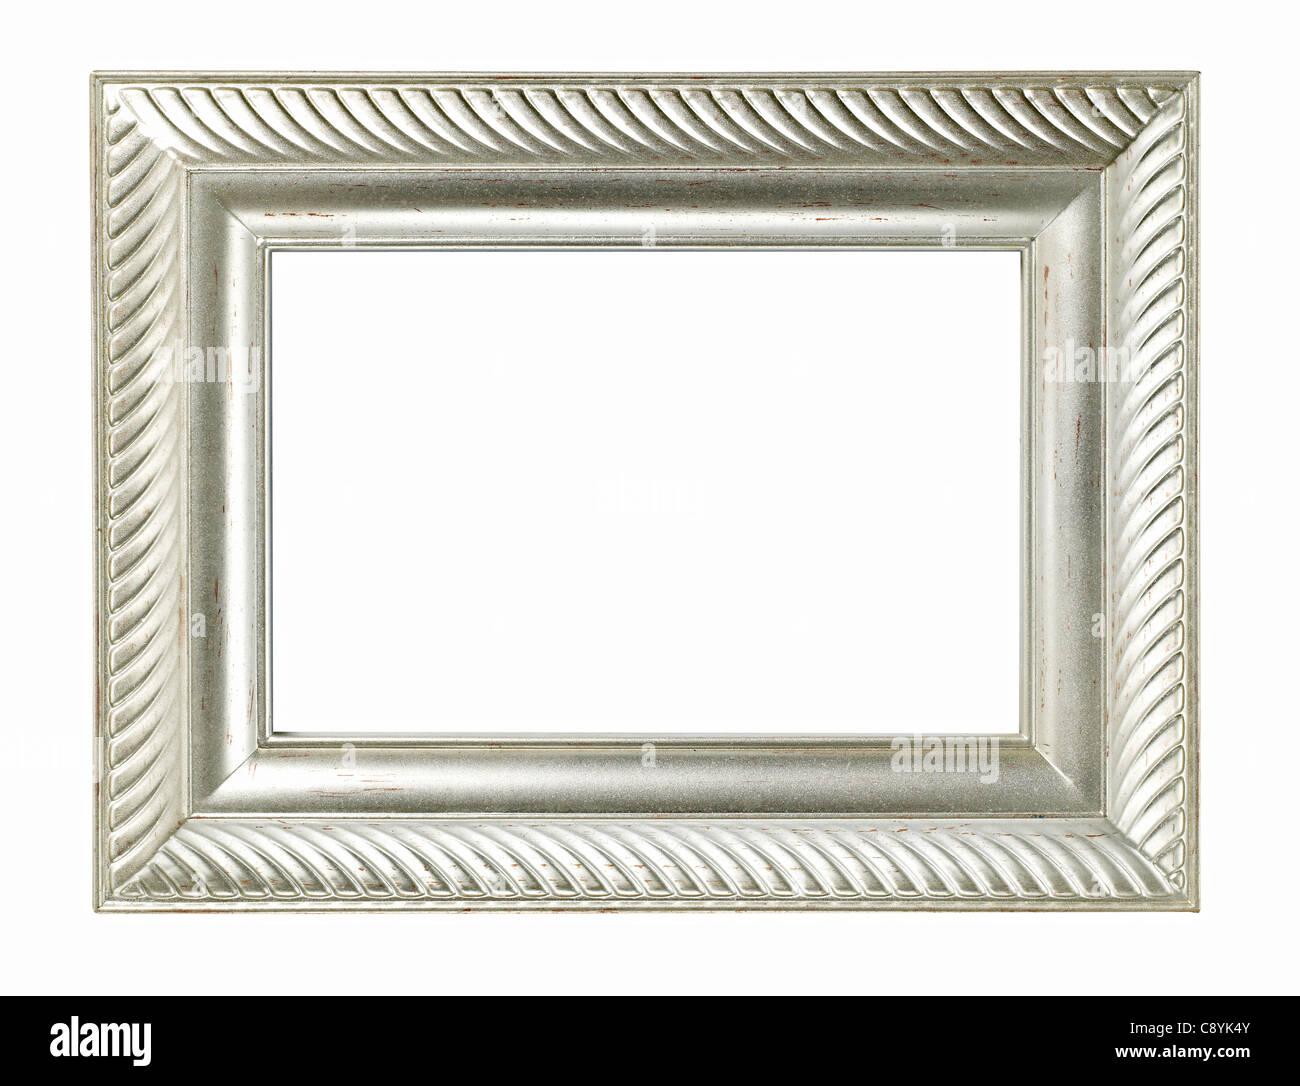 silber bilderrahmen metall-finish stockfoto, bild: 39945723 - alamy